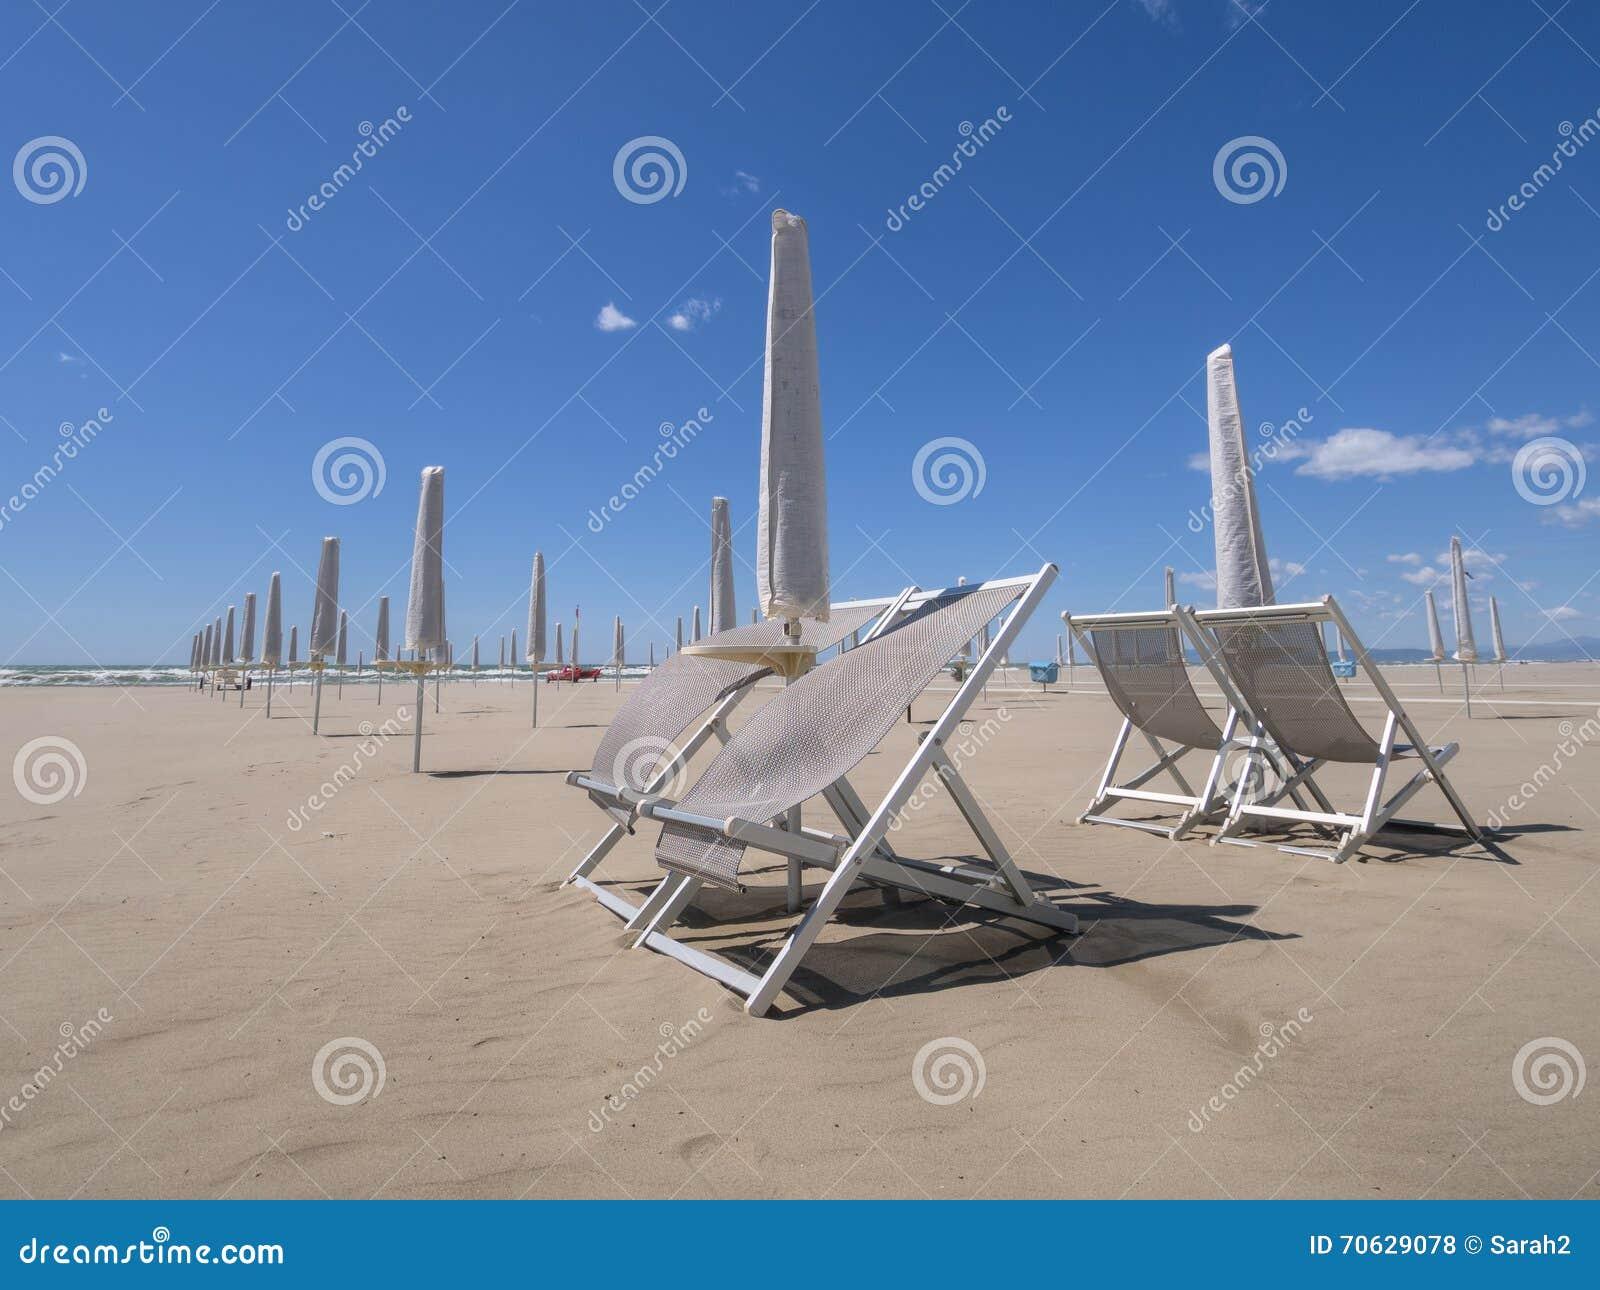 Viareggio beach, out of season. Looking out to sea.